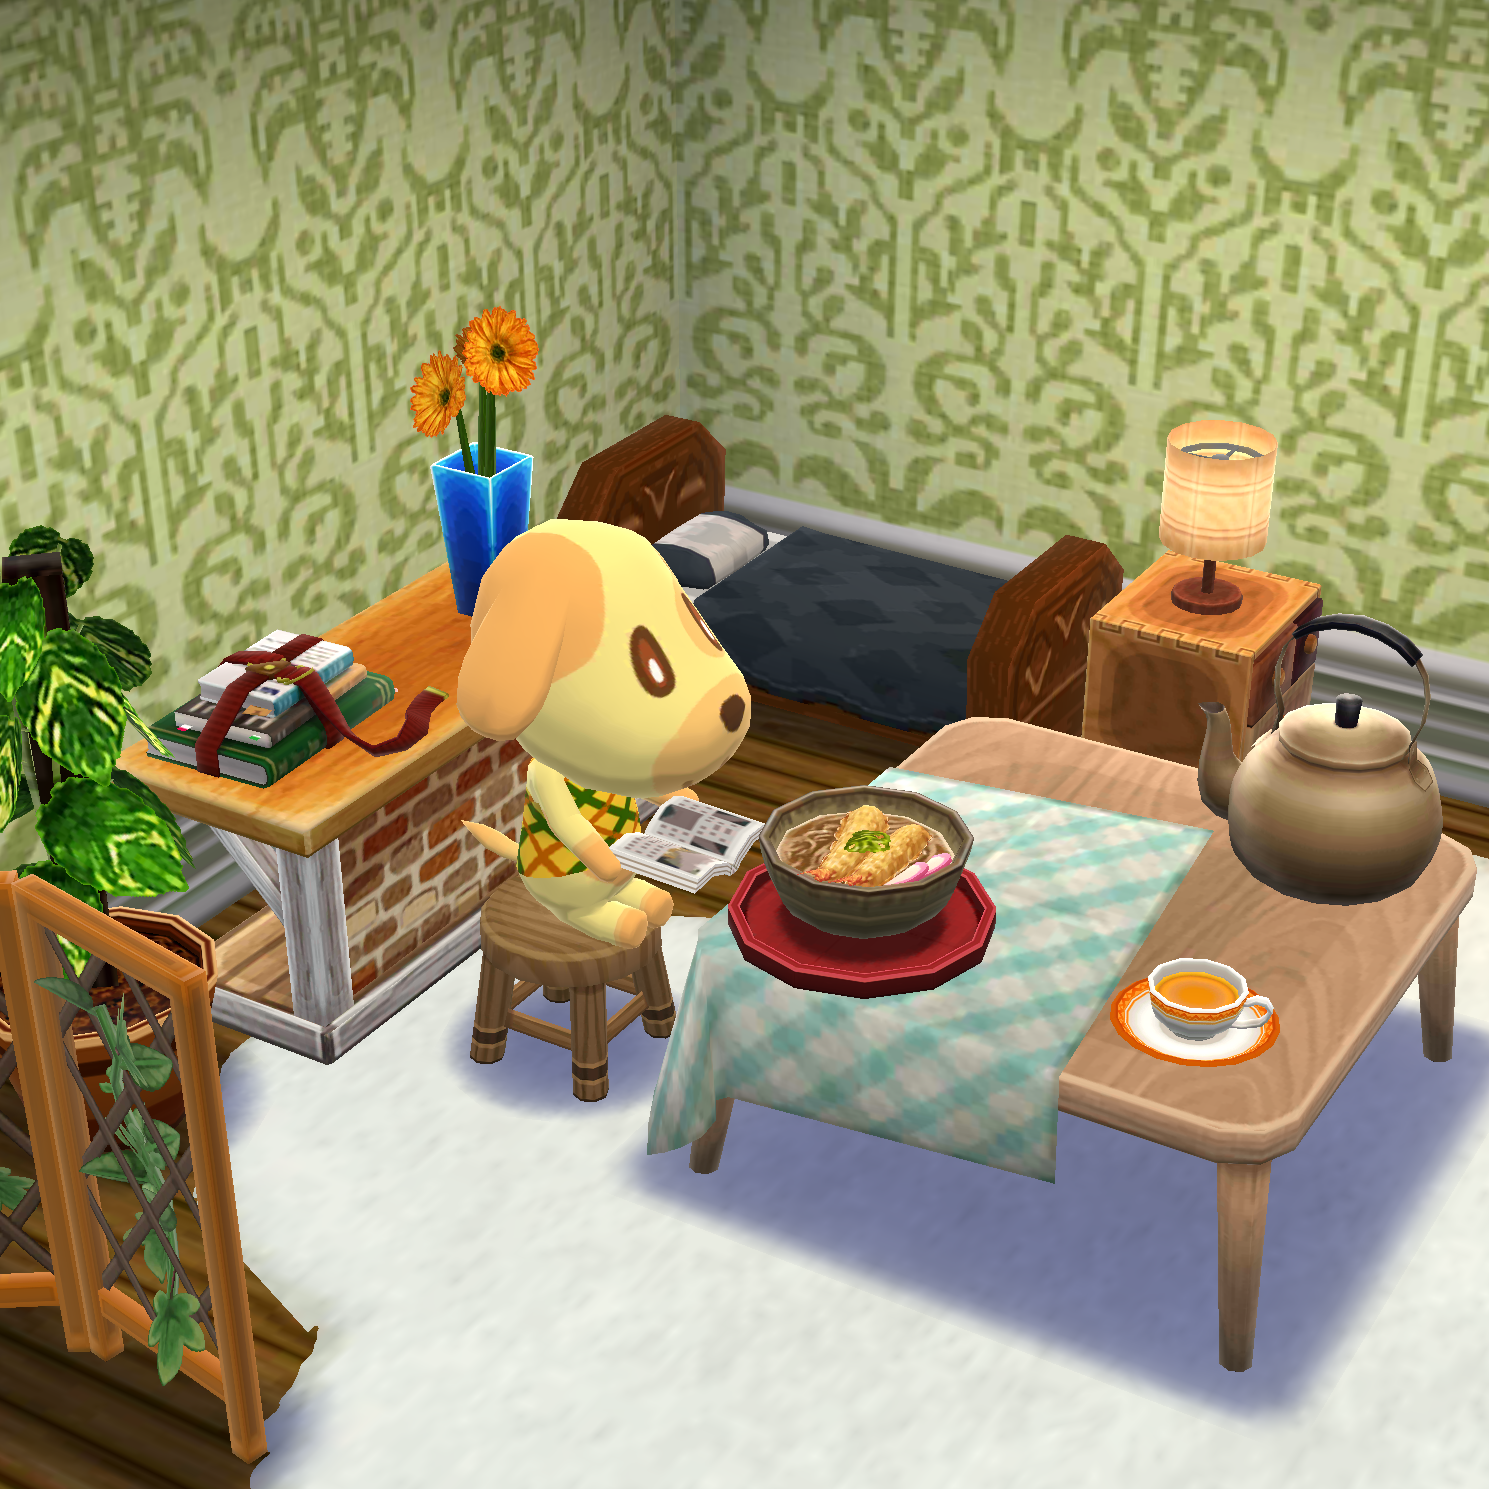 Goldie with ramen 🍜🌻 Animal crossing pocket camp, Animal